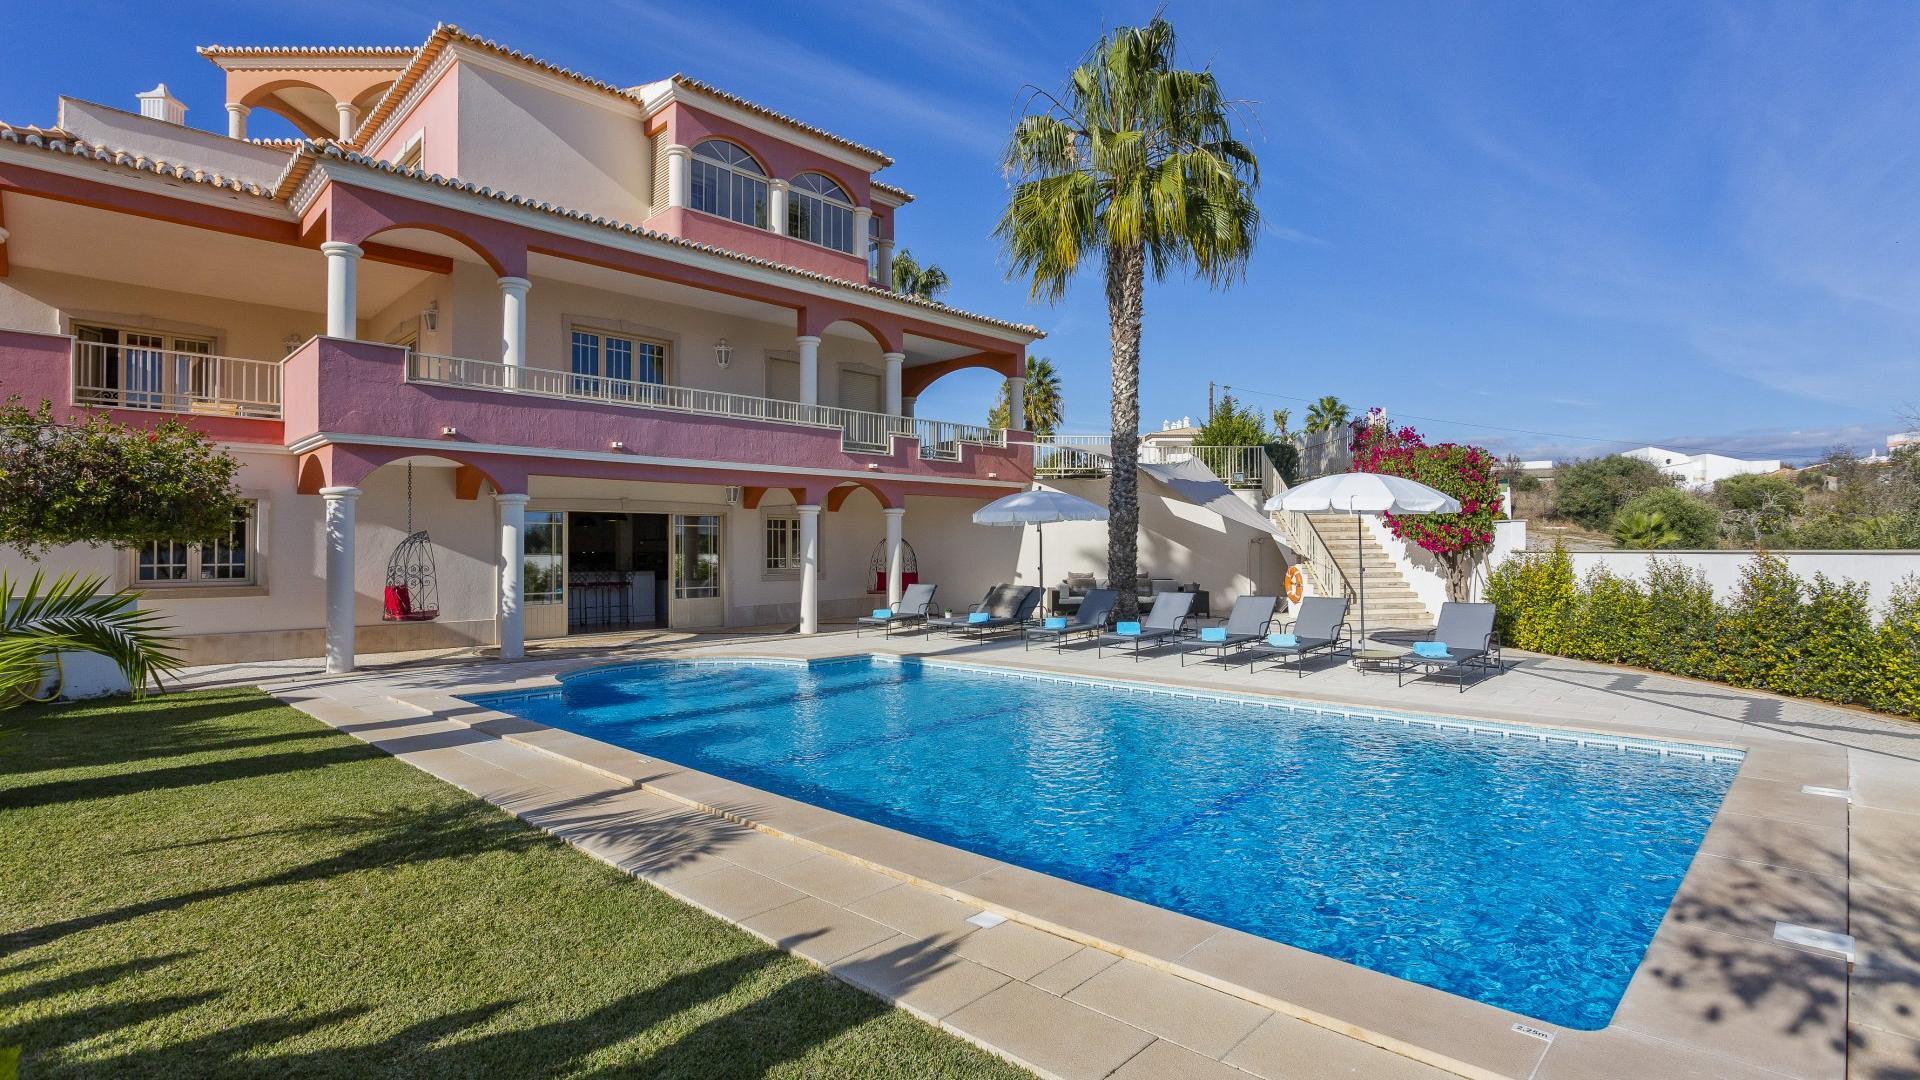 Villa Roma - Alvor, Portimão, Algarve - Villa_Roma_Exterior_3.jpg